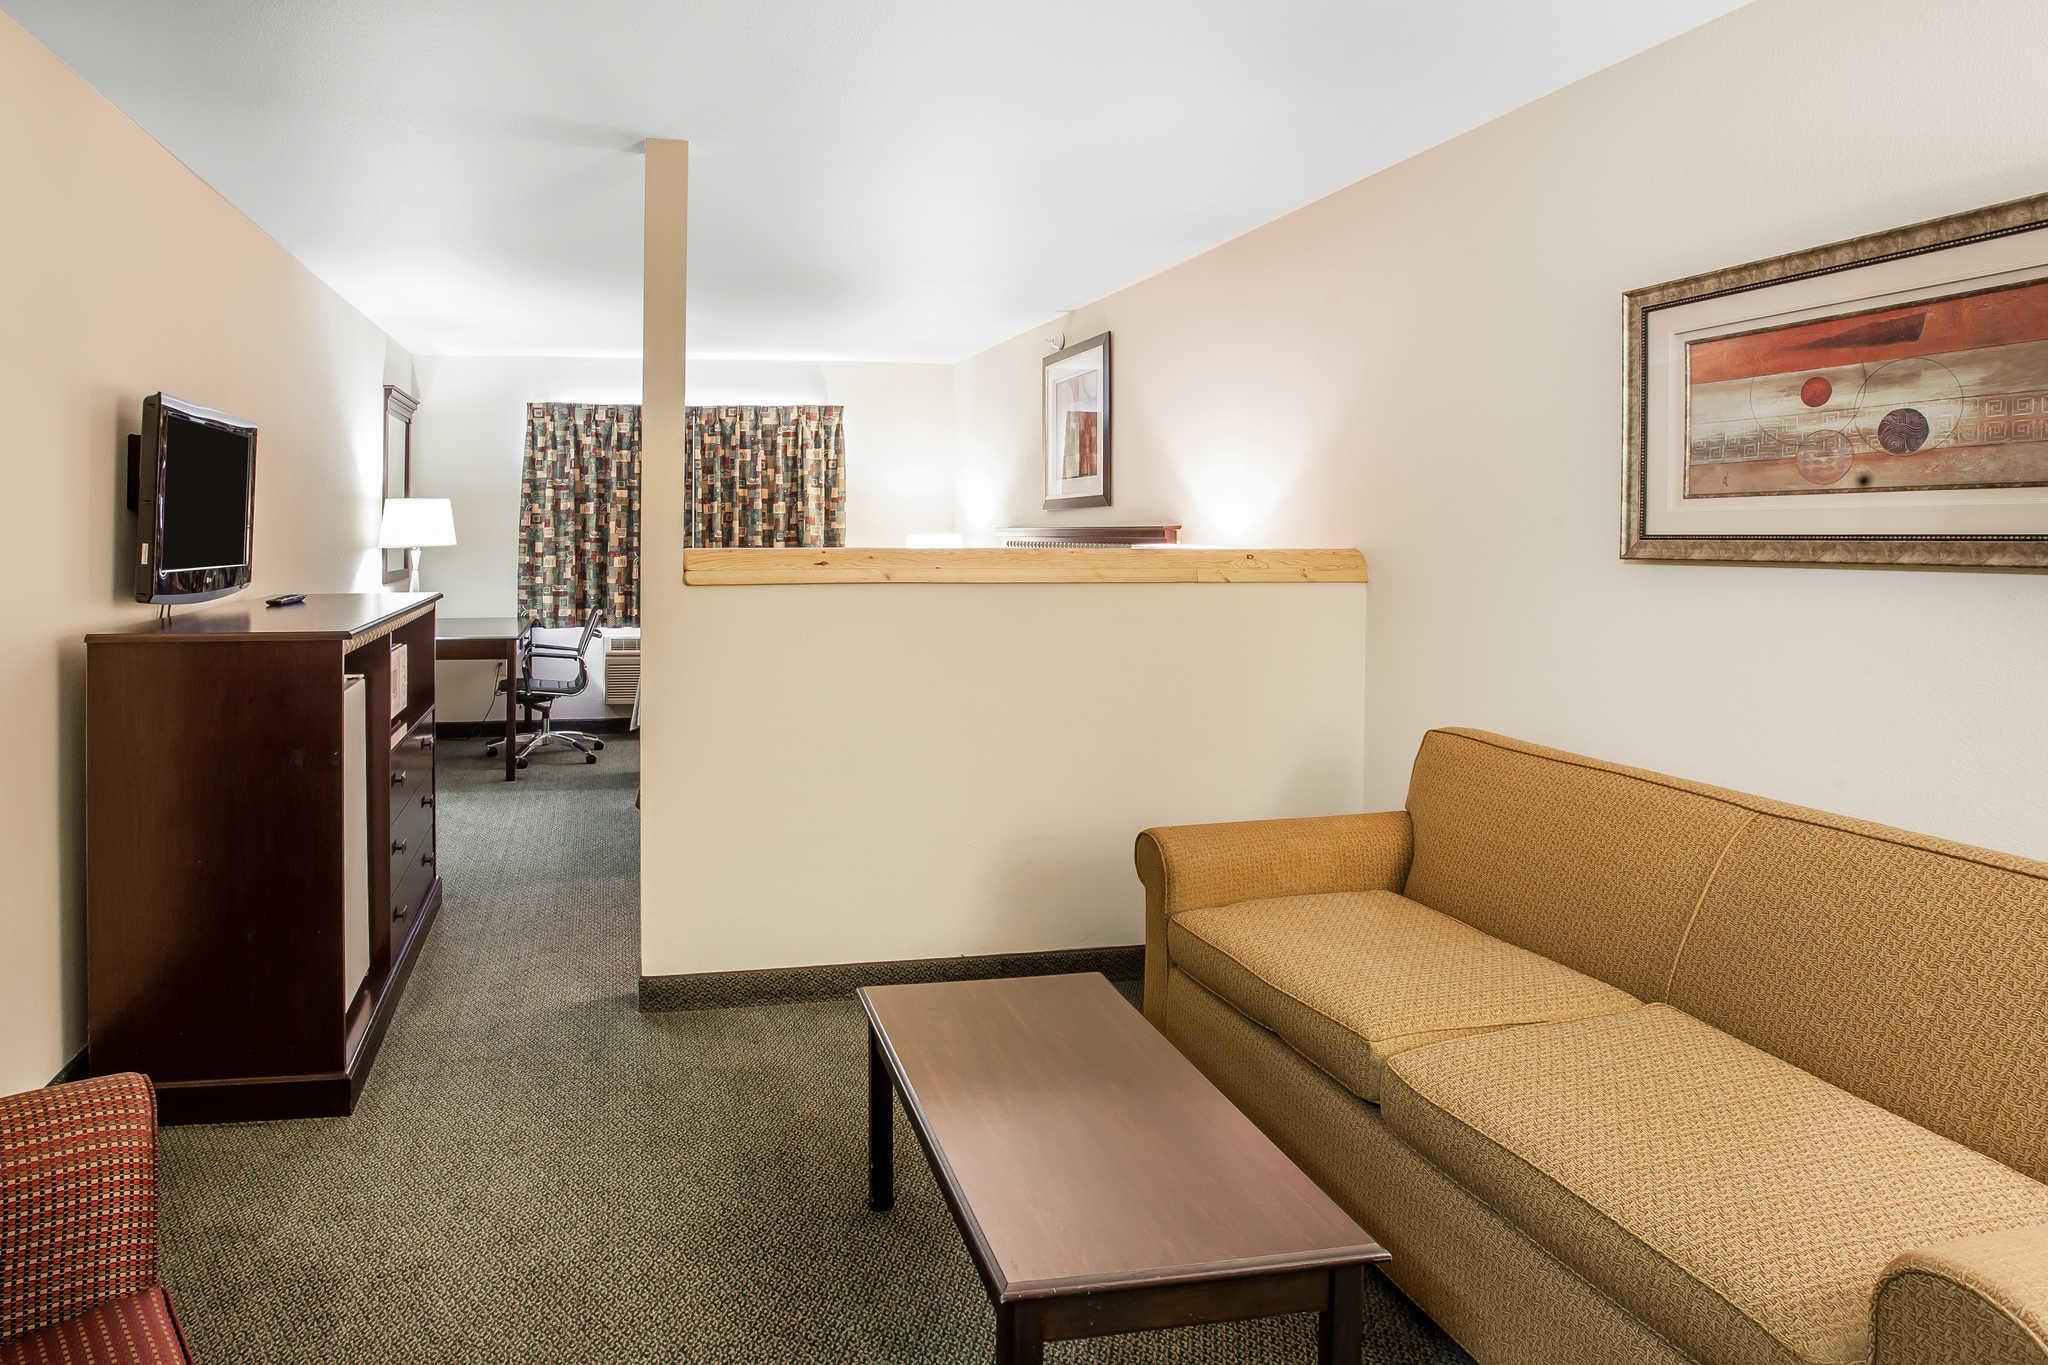 Comfort Inn Downtown image 11